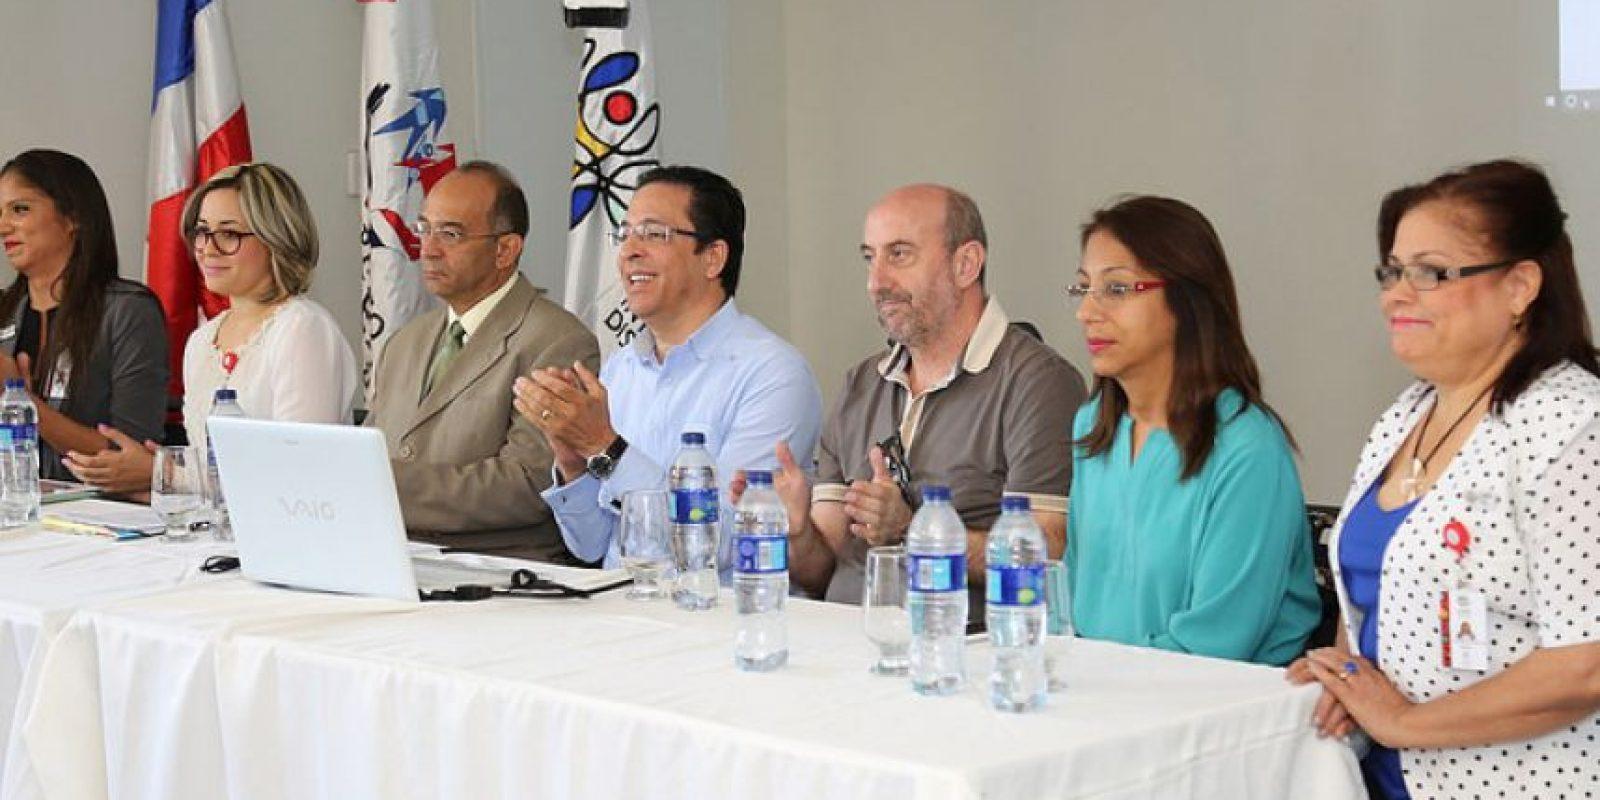 Antonio Fuertes Foto:PresidenciaRD